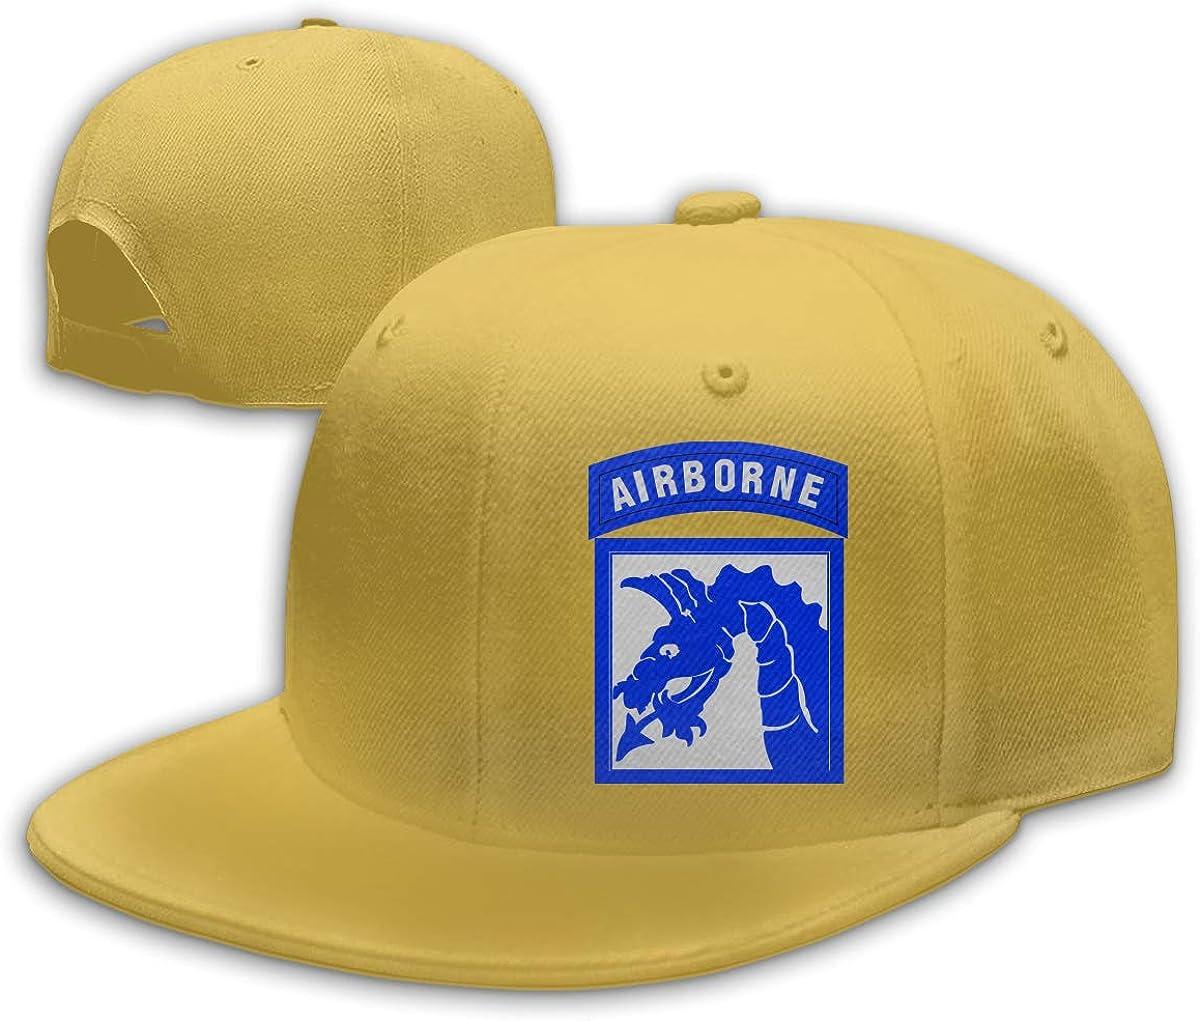 Xindianpucsk 18th Airborne Corps Baseball Cap Fashion Hat